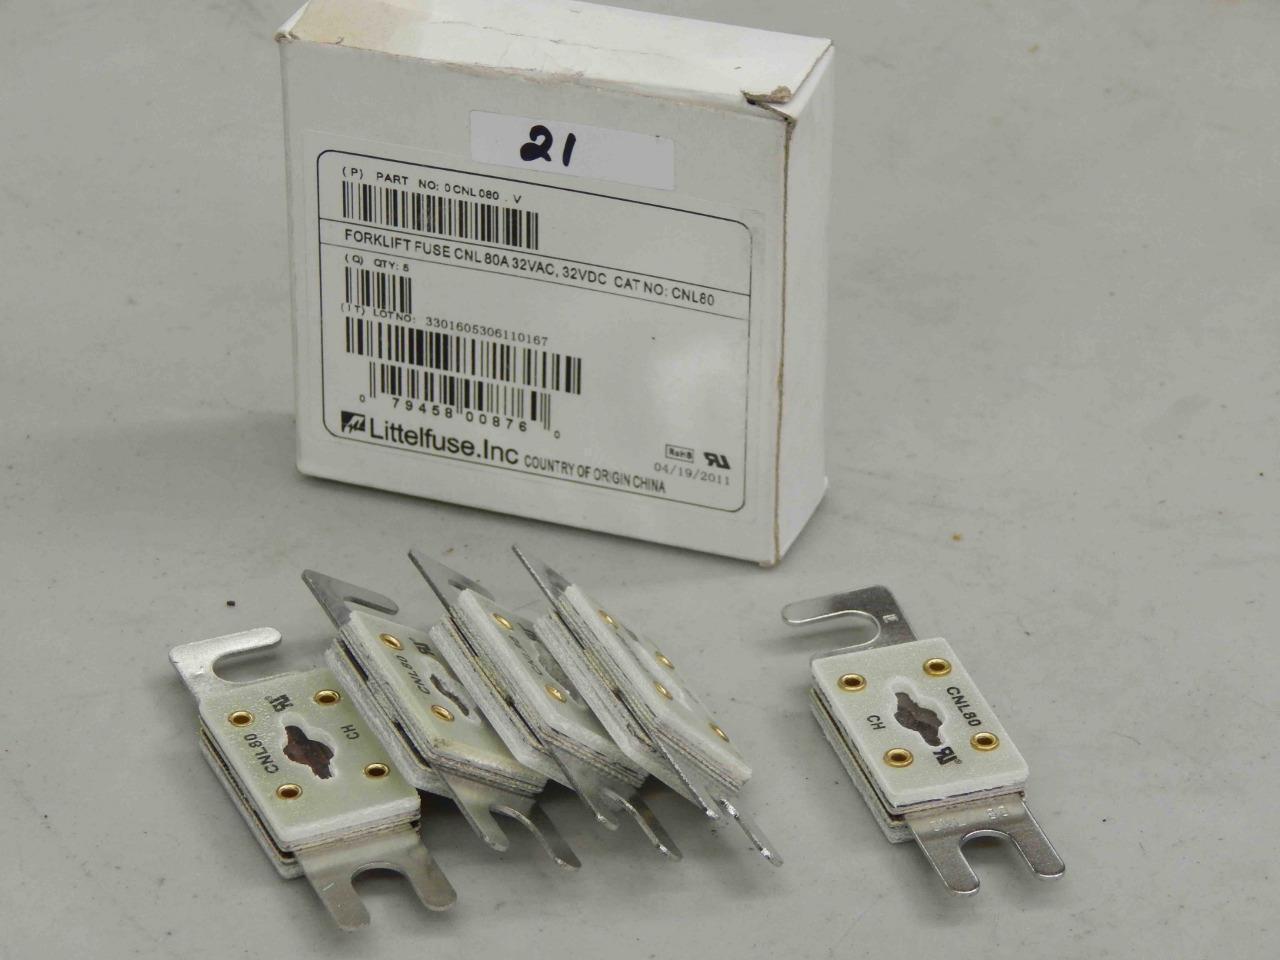 21 Lot Of 5 Littelfuse Cnl80 Forklift Fuse 80a 32vac 32vdc New Fuses Types Mc Sales Llc